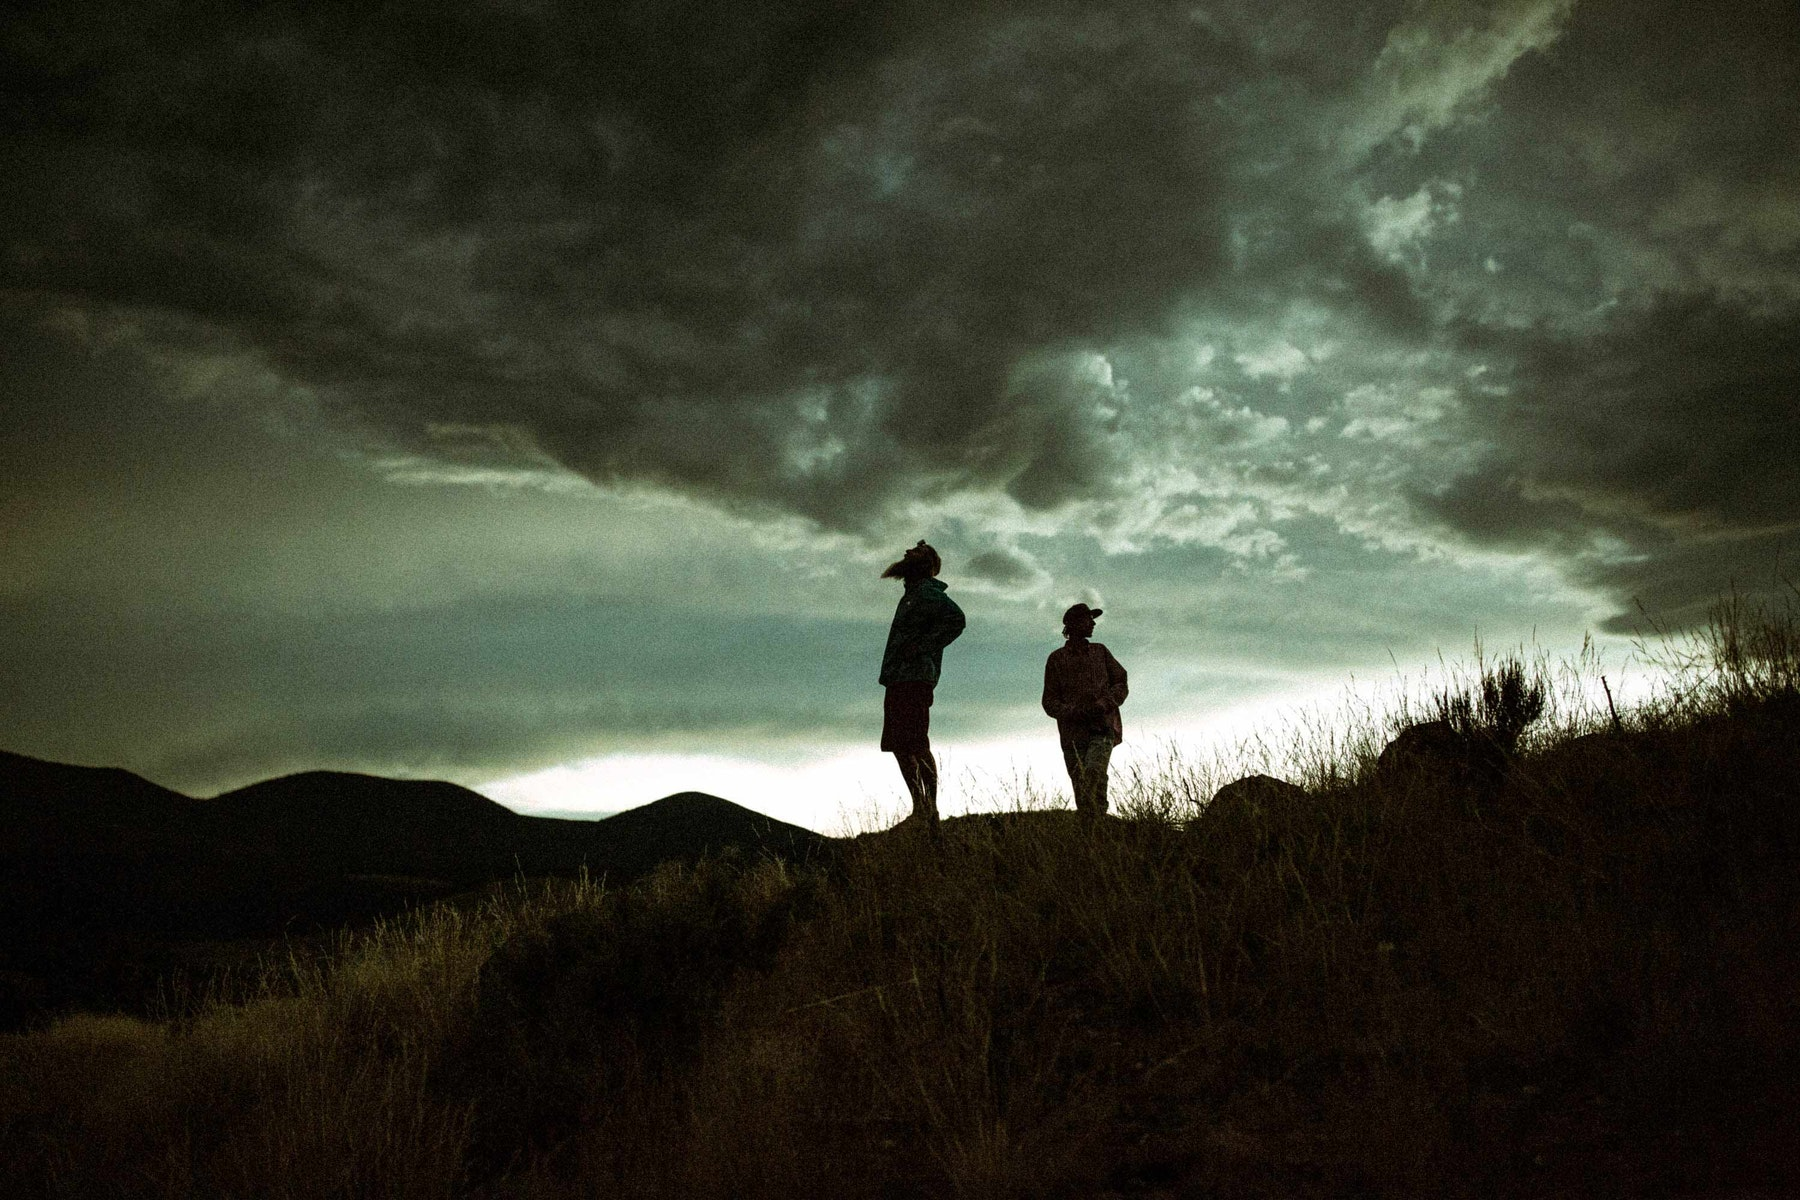 Photo by Sean Murphy